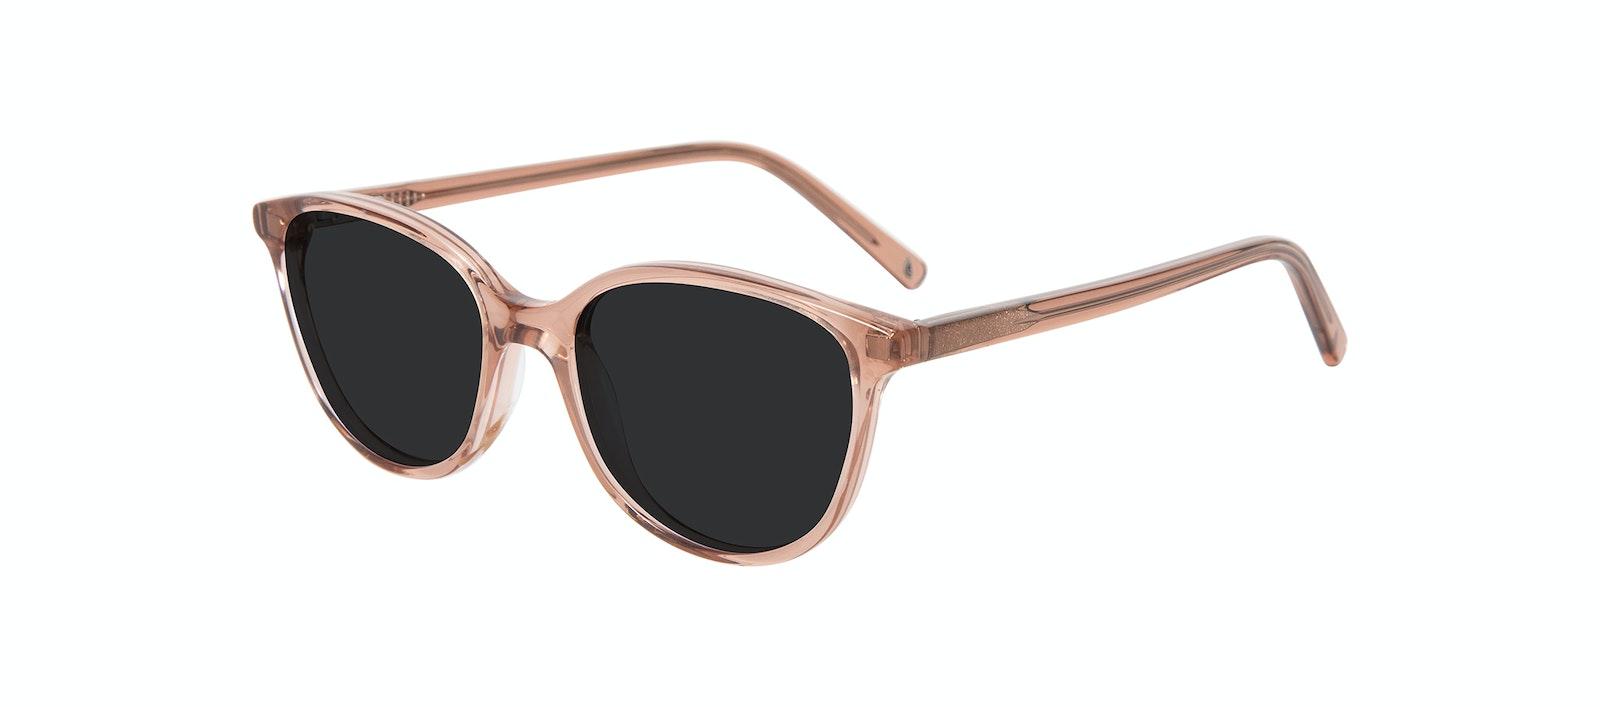 Affordable Fashion Glasses Cat Eye Sunglasses Kids Imagine Junior Rose Tilt